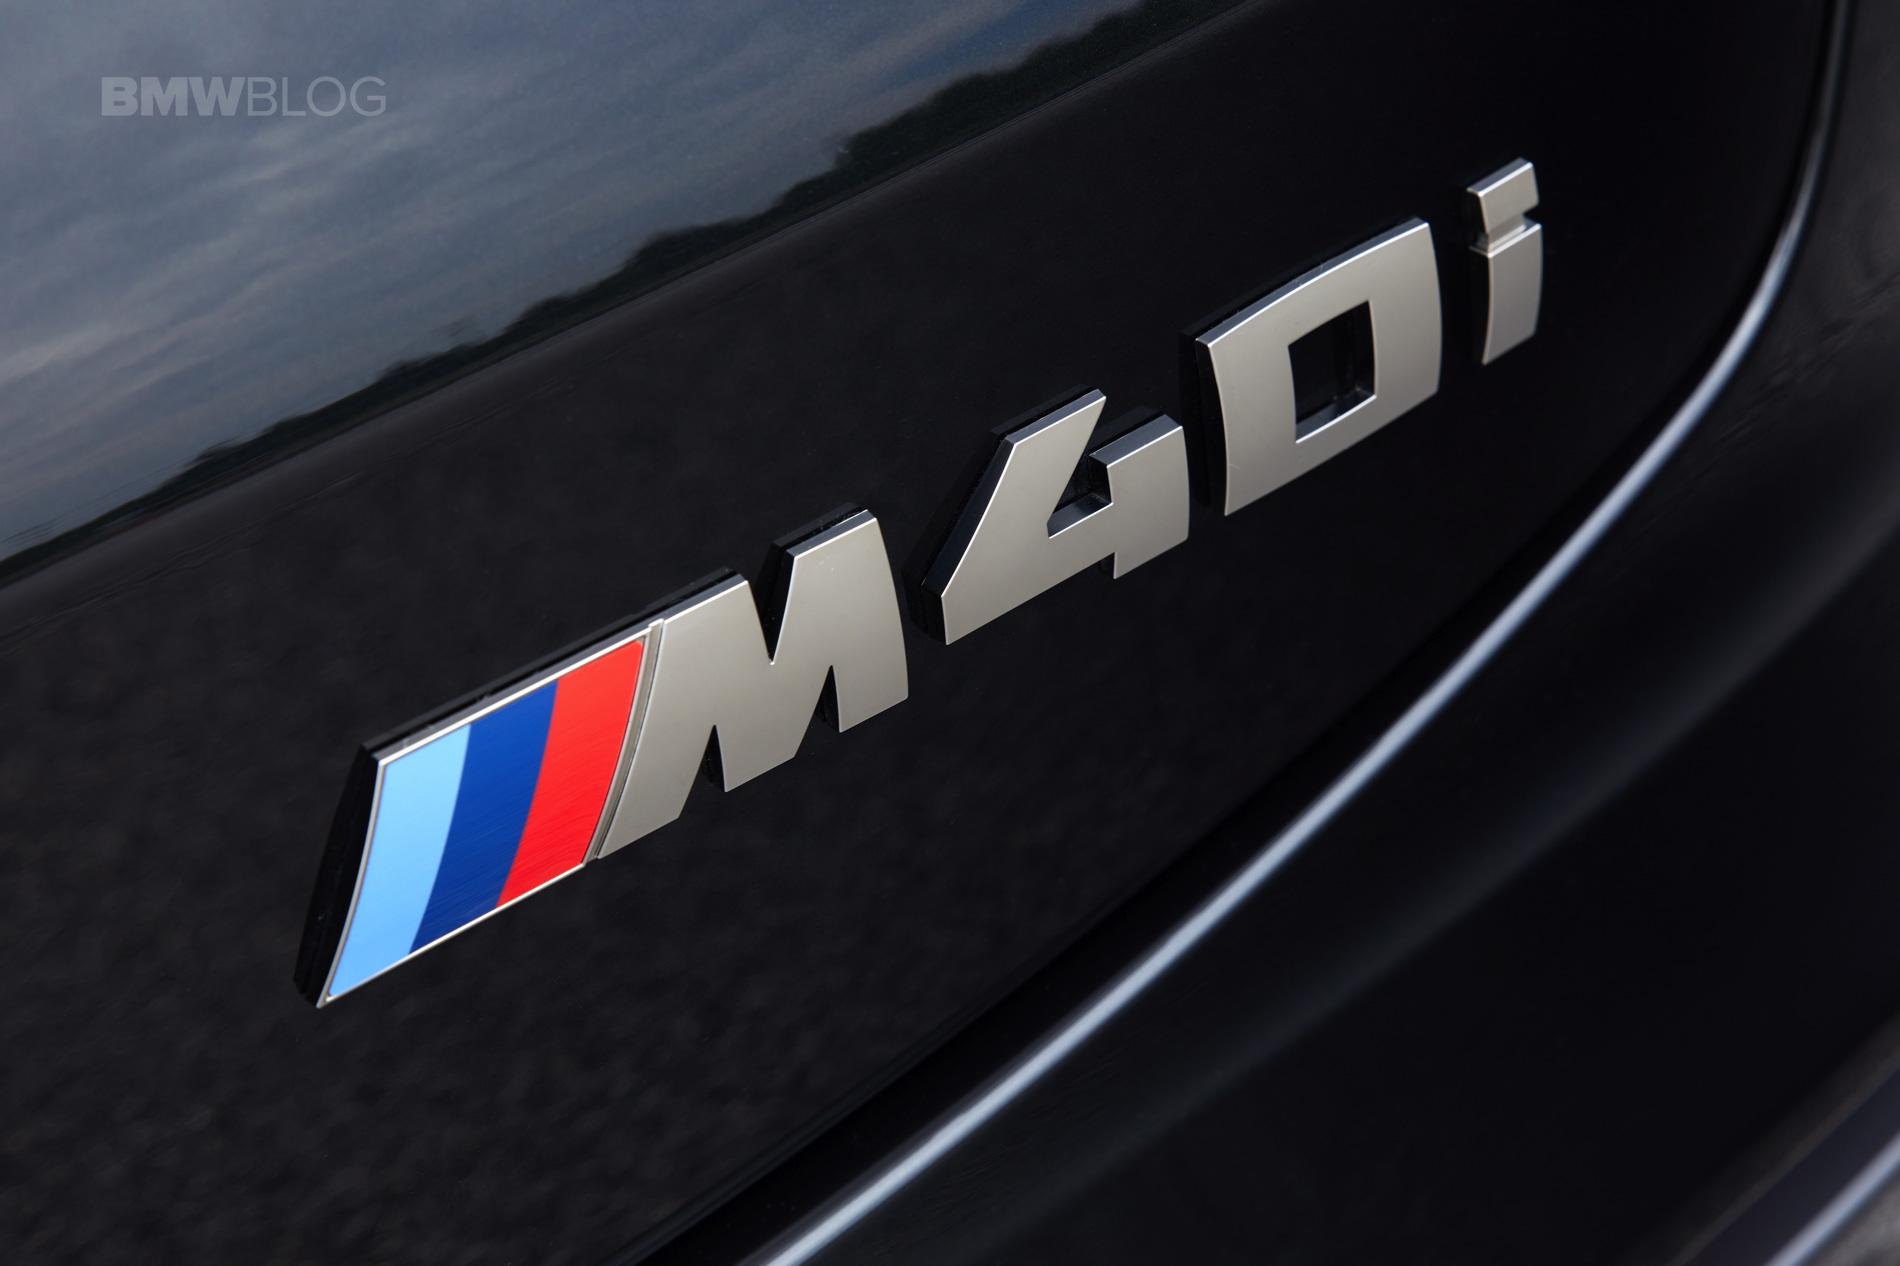 2019 G02 BMW X4 M40i test drive 61